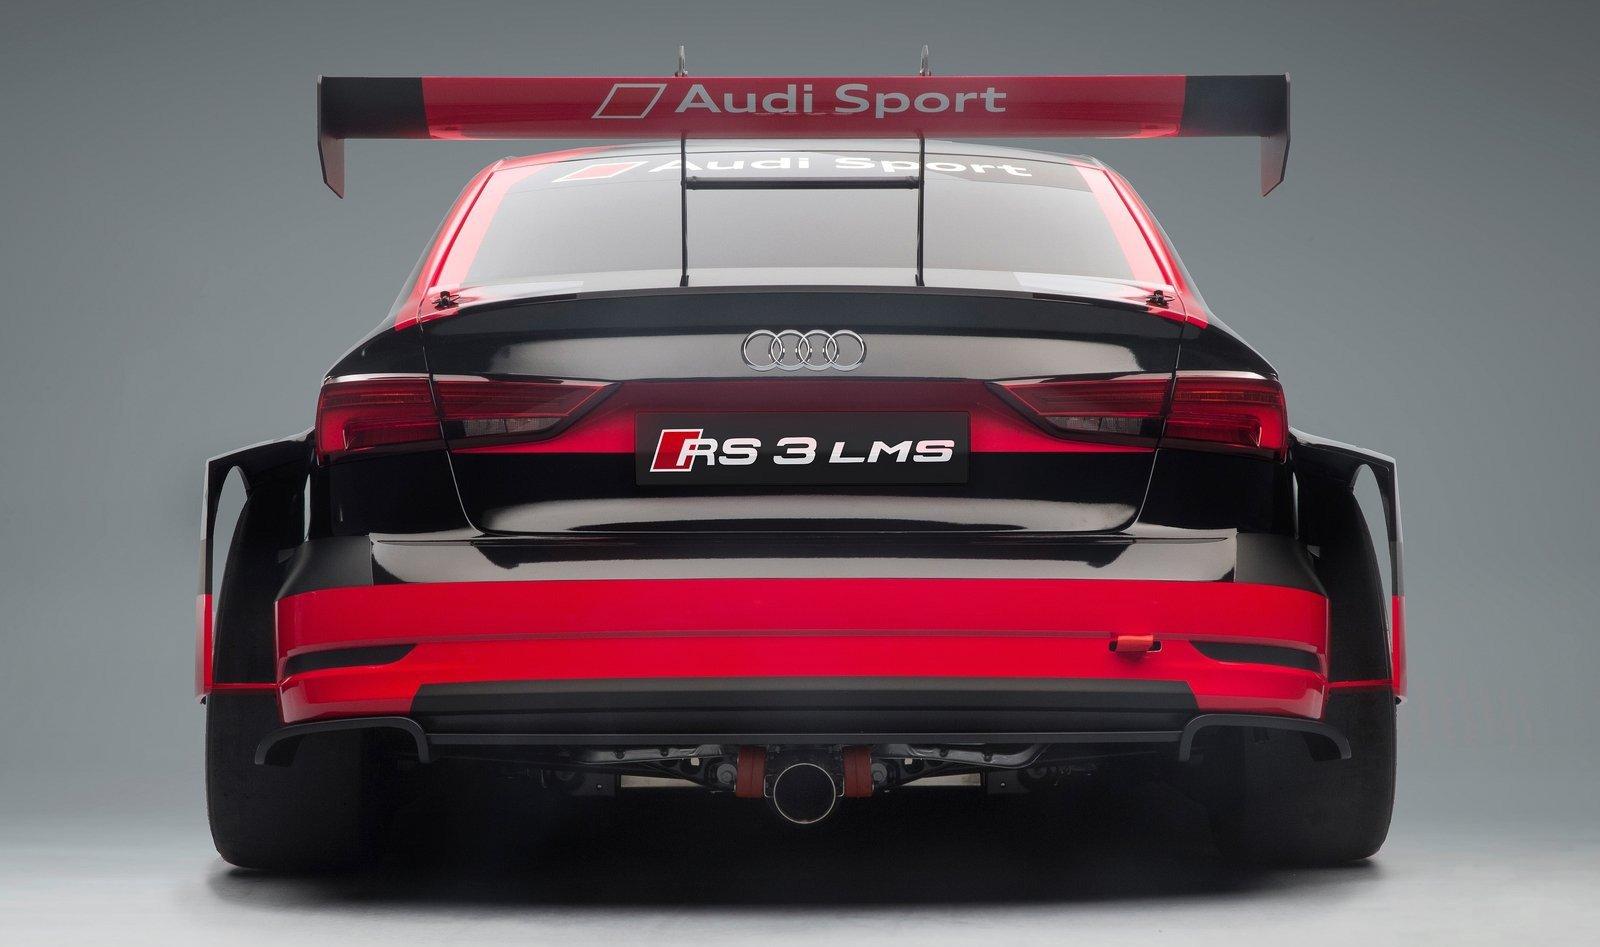 Audi RS3 LMS - TCR class race car, 2.0 TFSI, 330 hp Paul ...